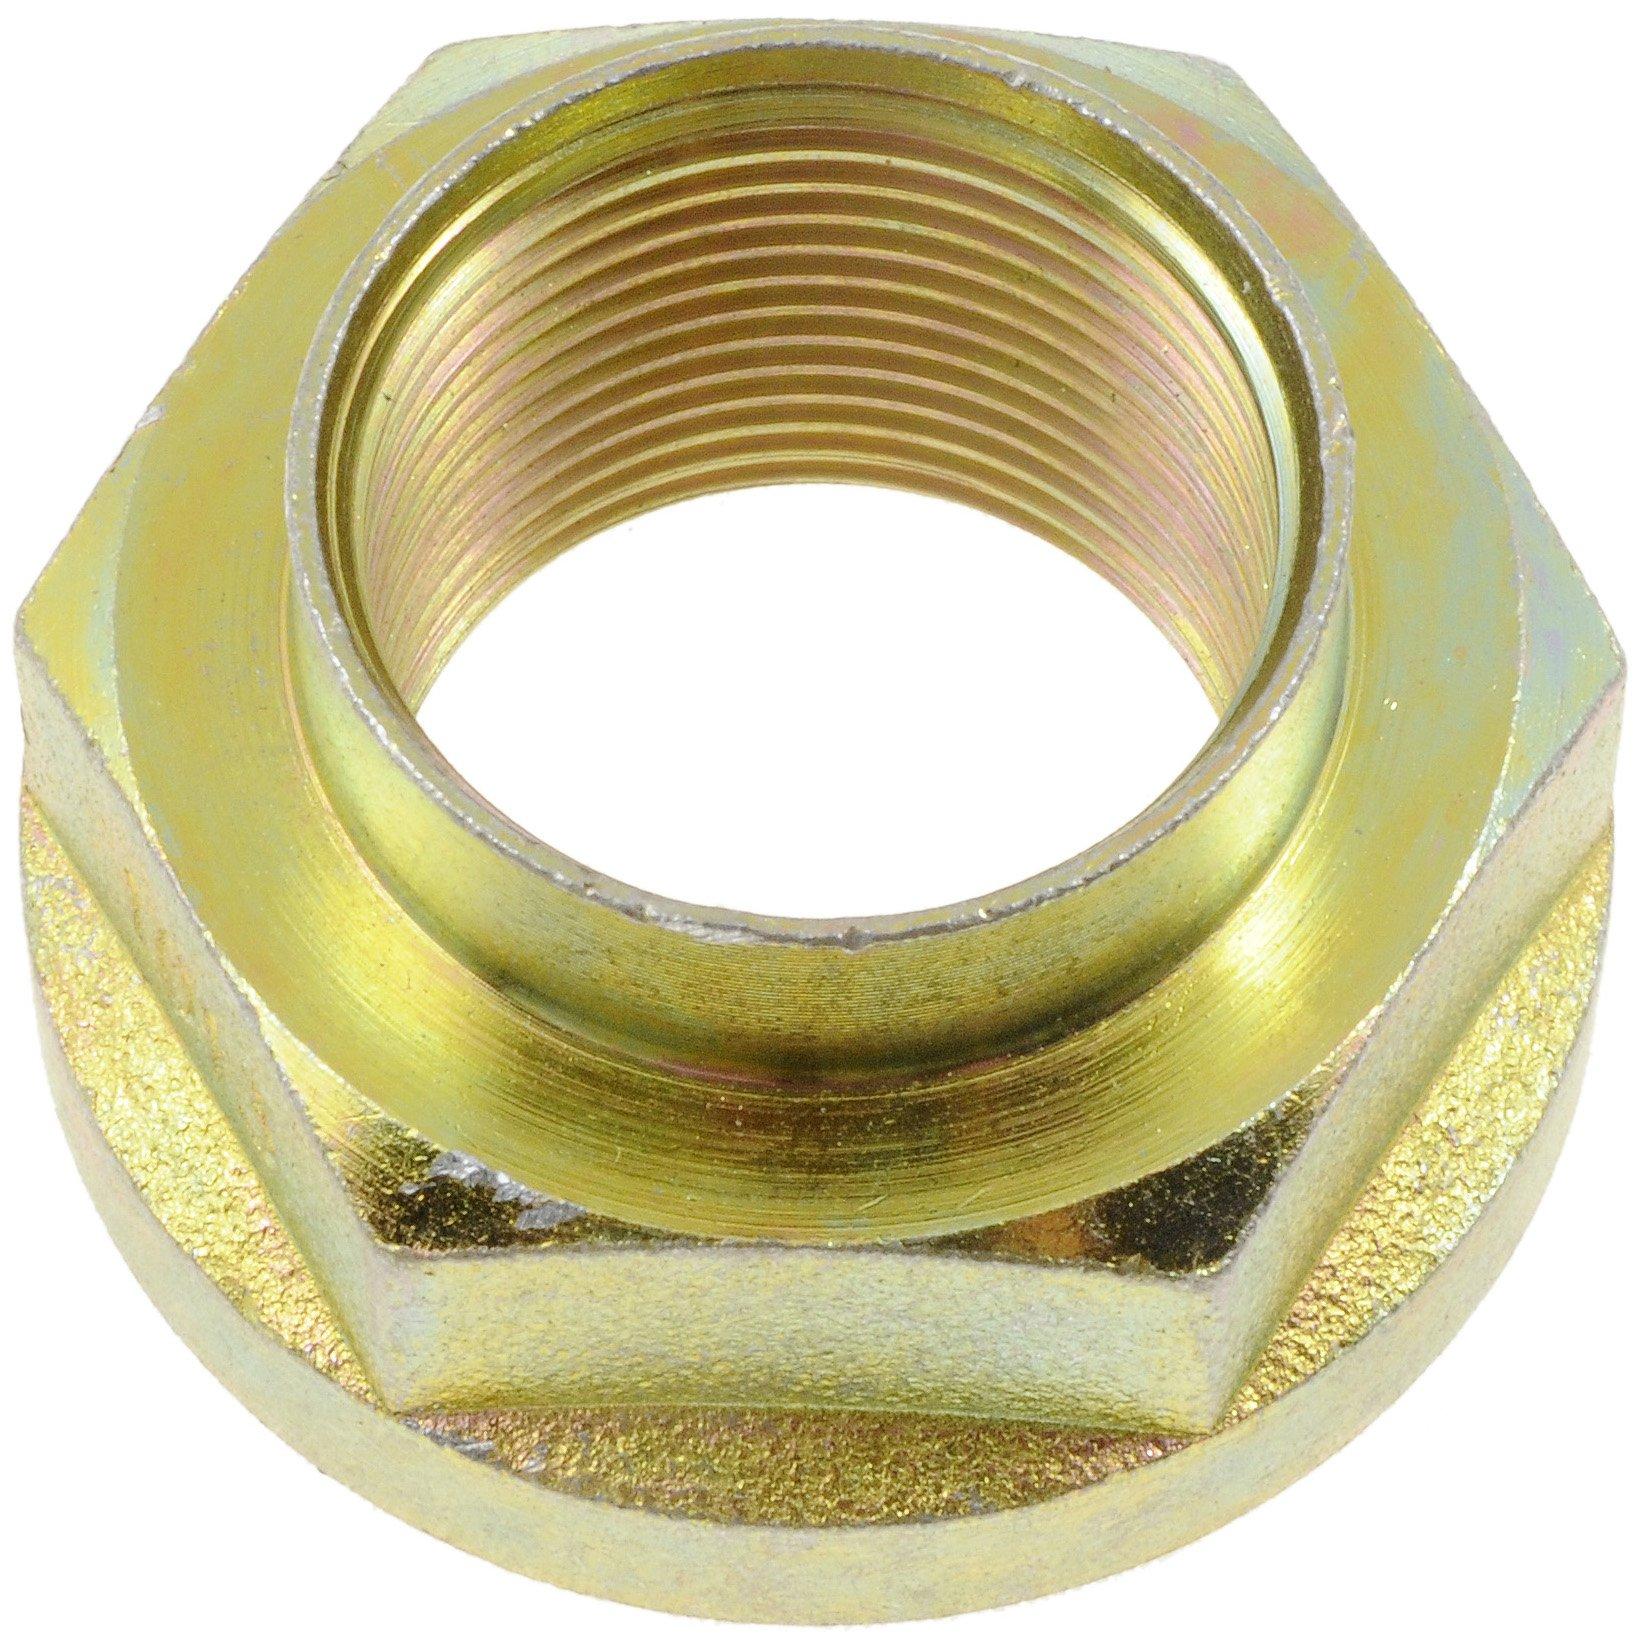 Dorman HELP! 05121 Spindle Lock Nut Kit